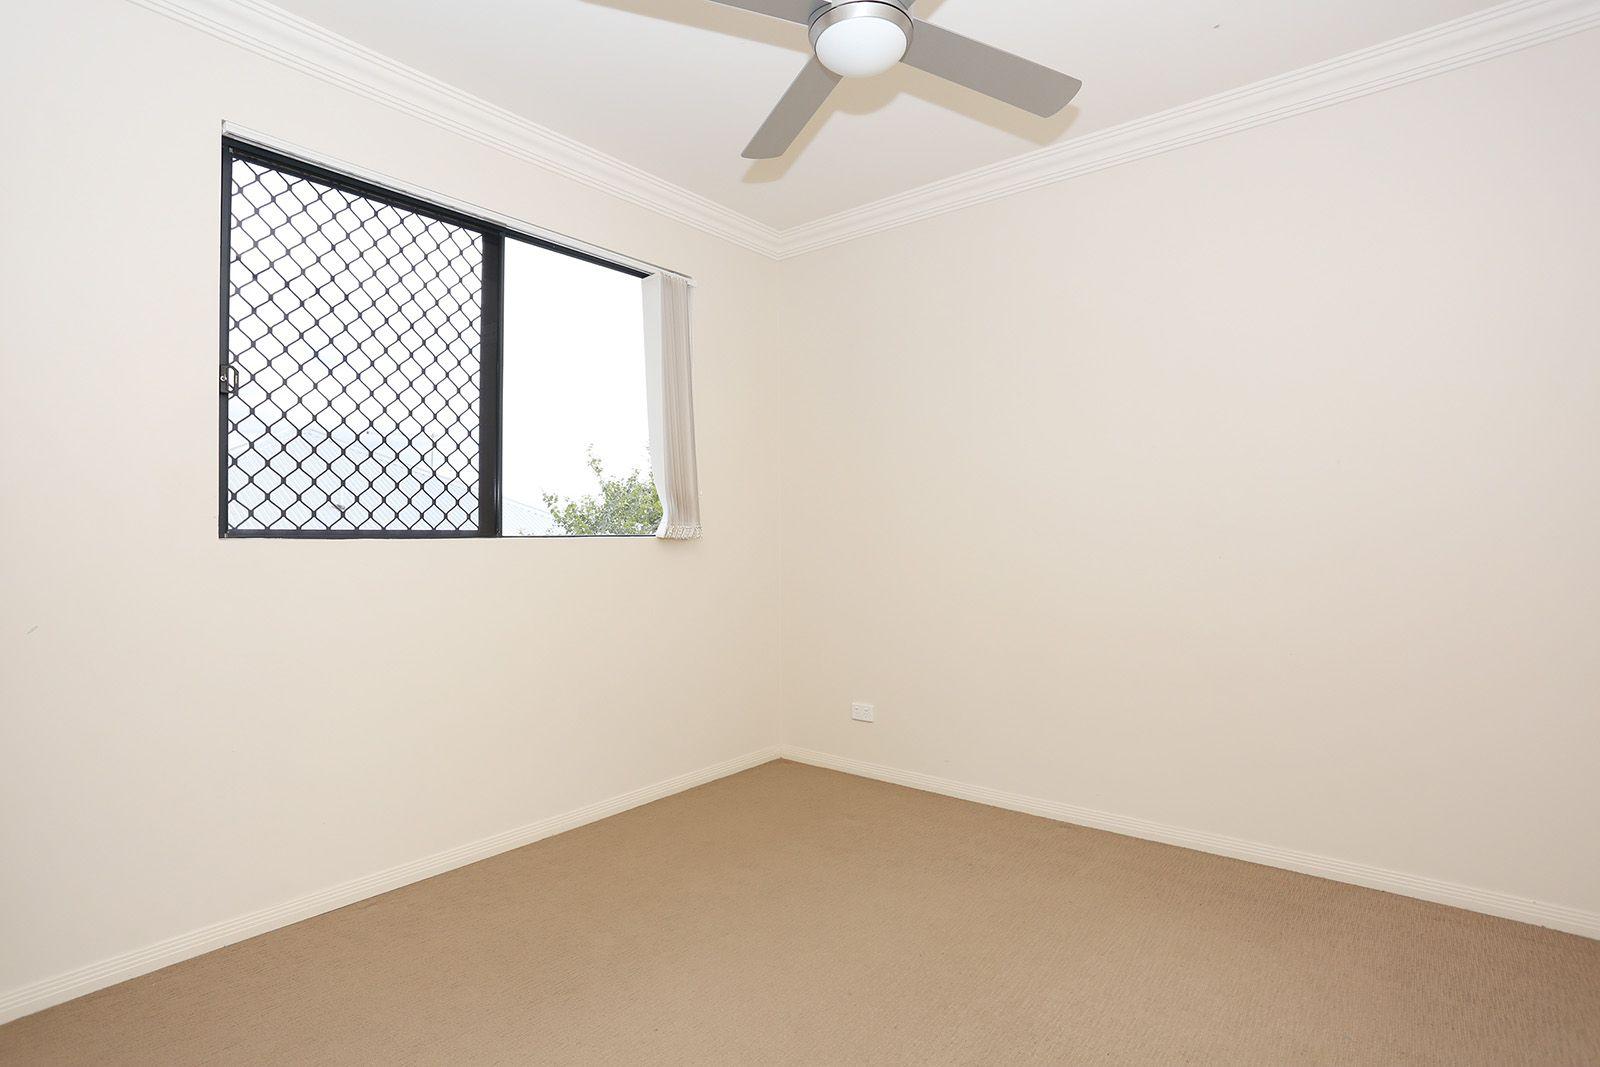 5/33 Station Ave, Gaythorne QLD 4051, Image 1